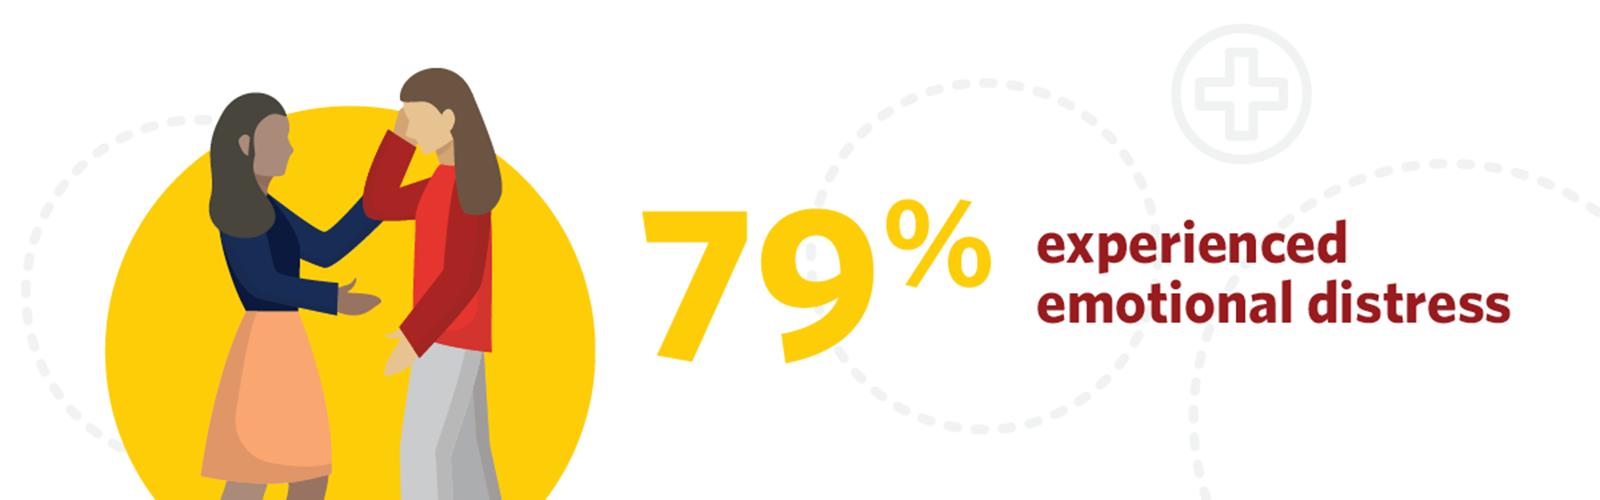 Graphic statistic of millennial dementia caregivers